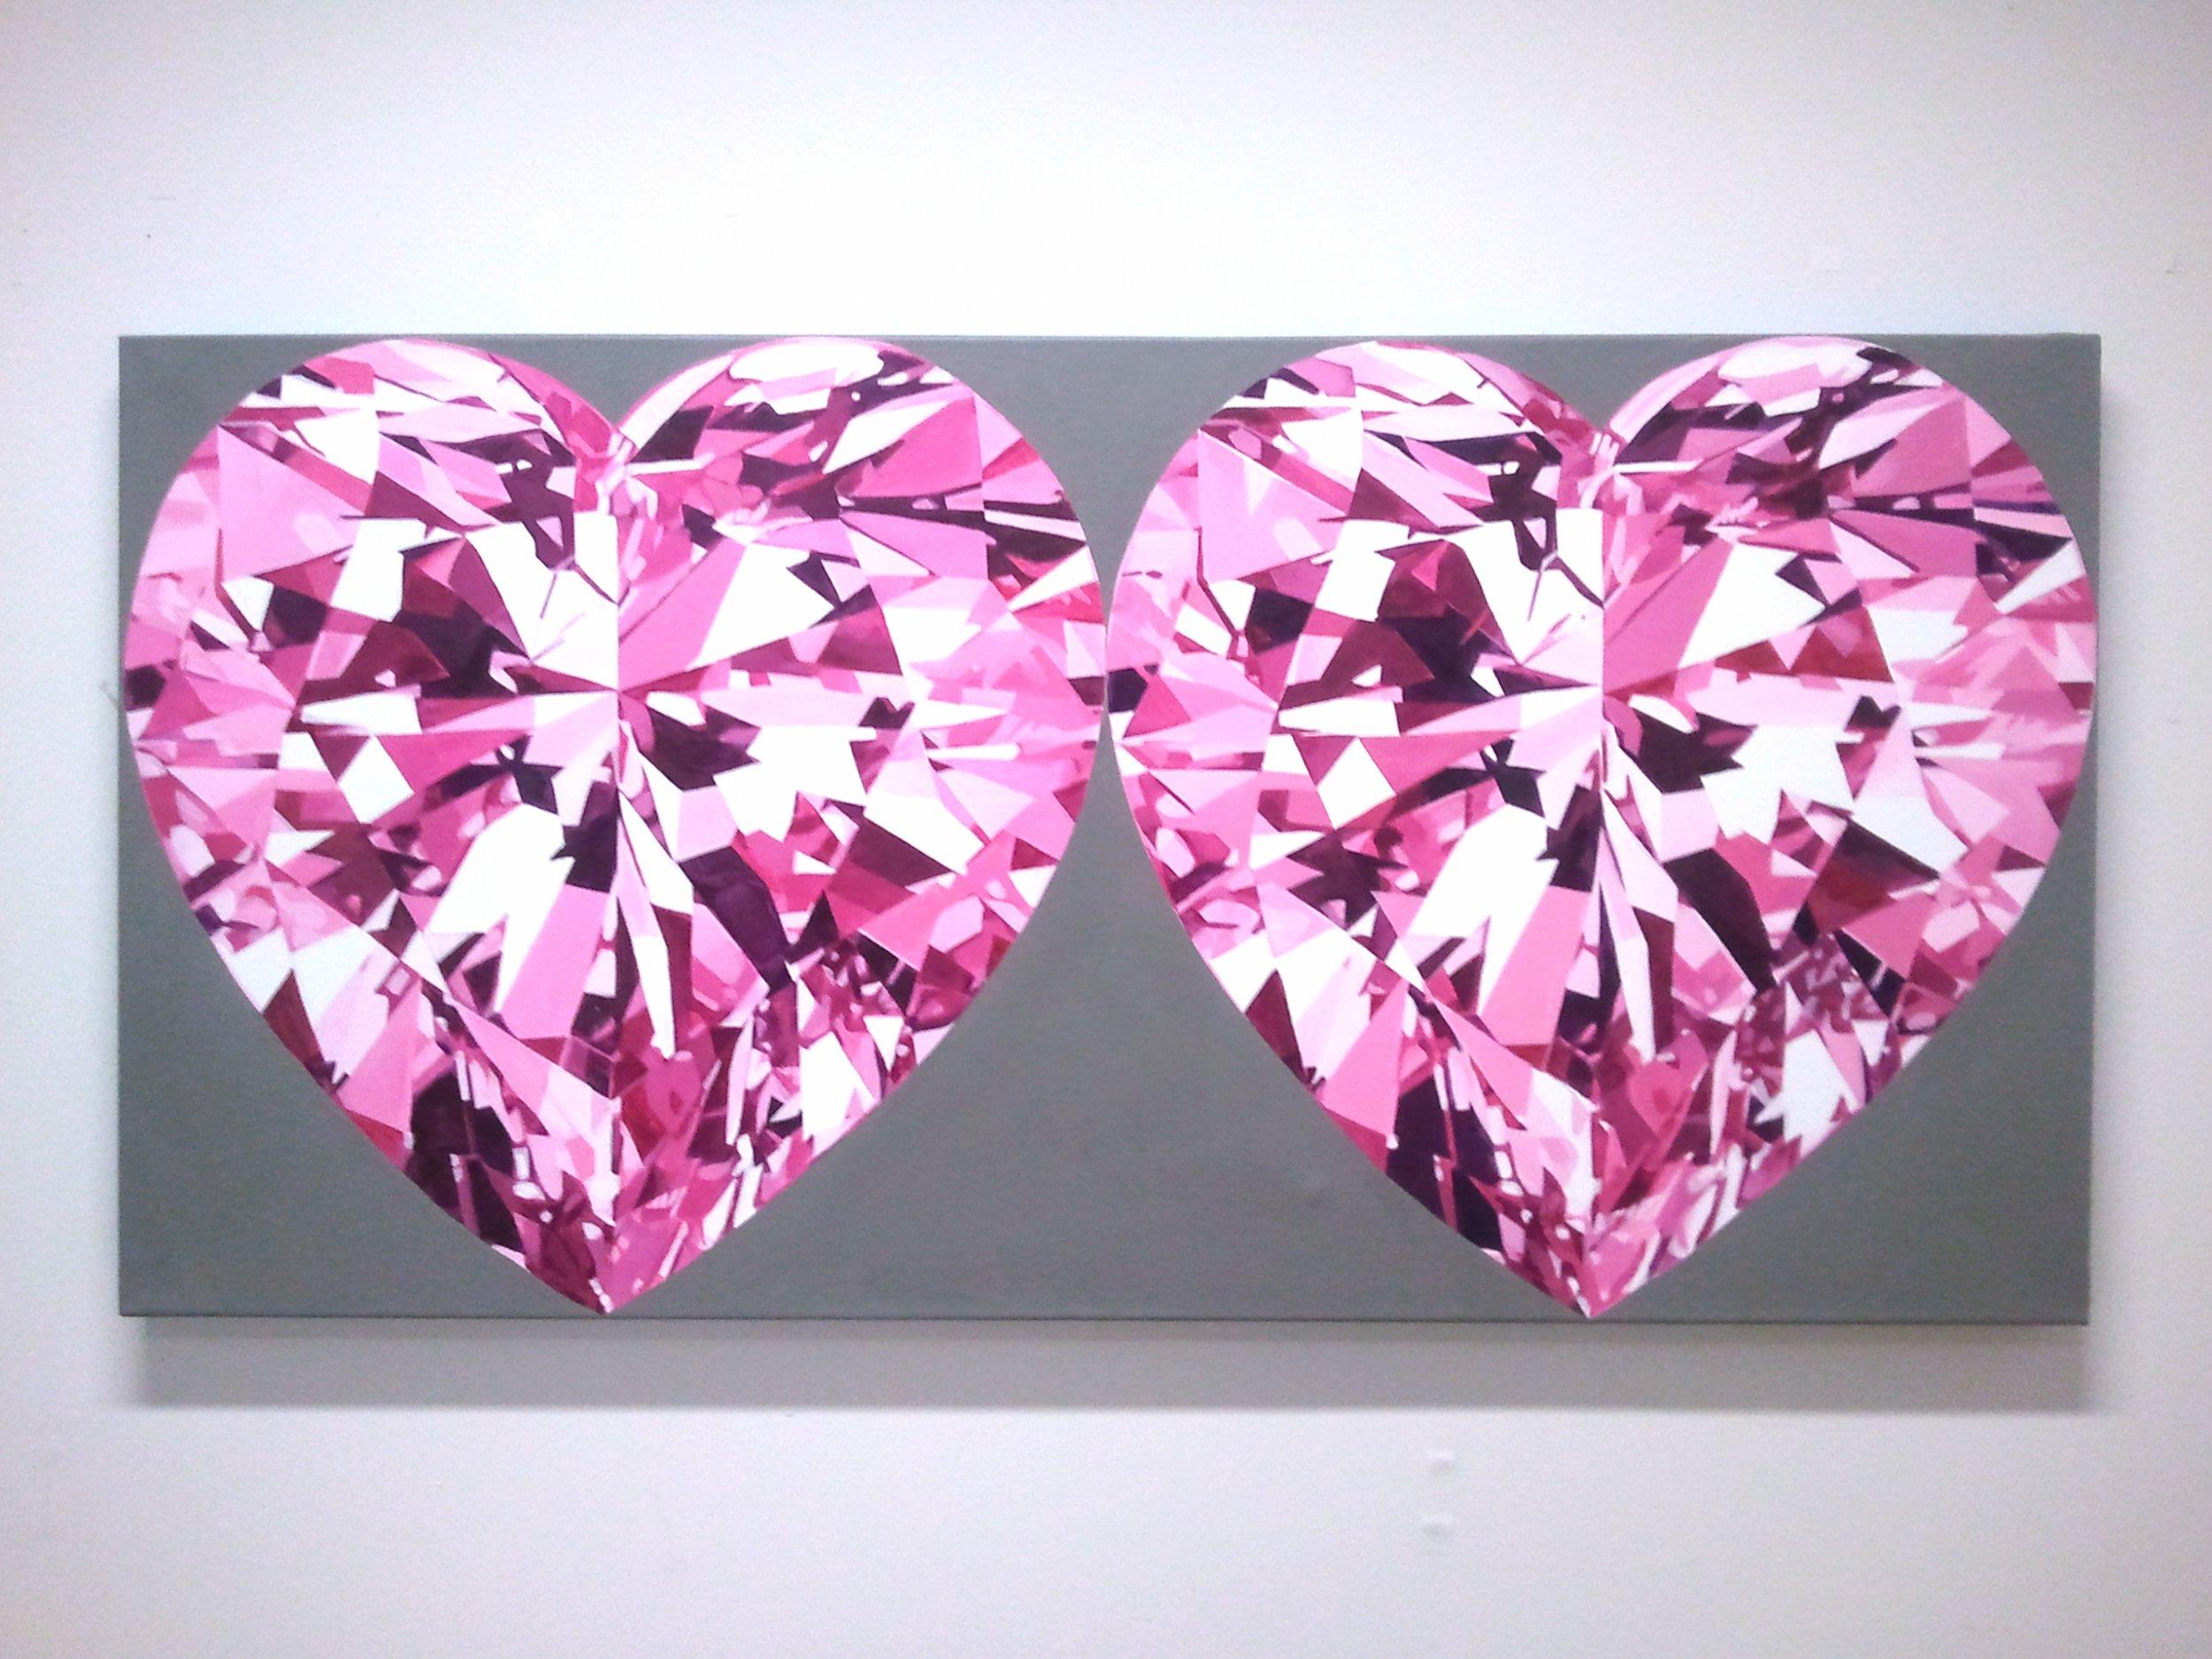 two pink heart diamonds minsung chloe keyoung artwork